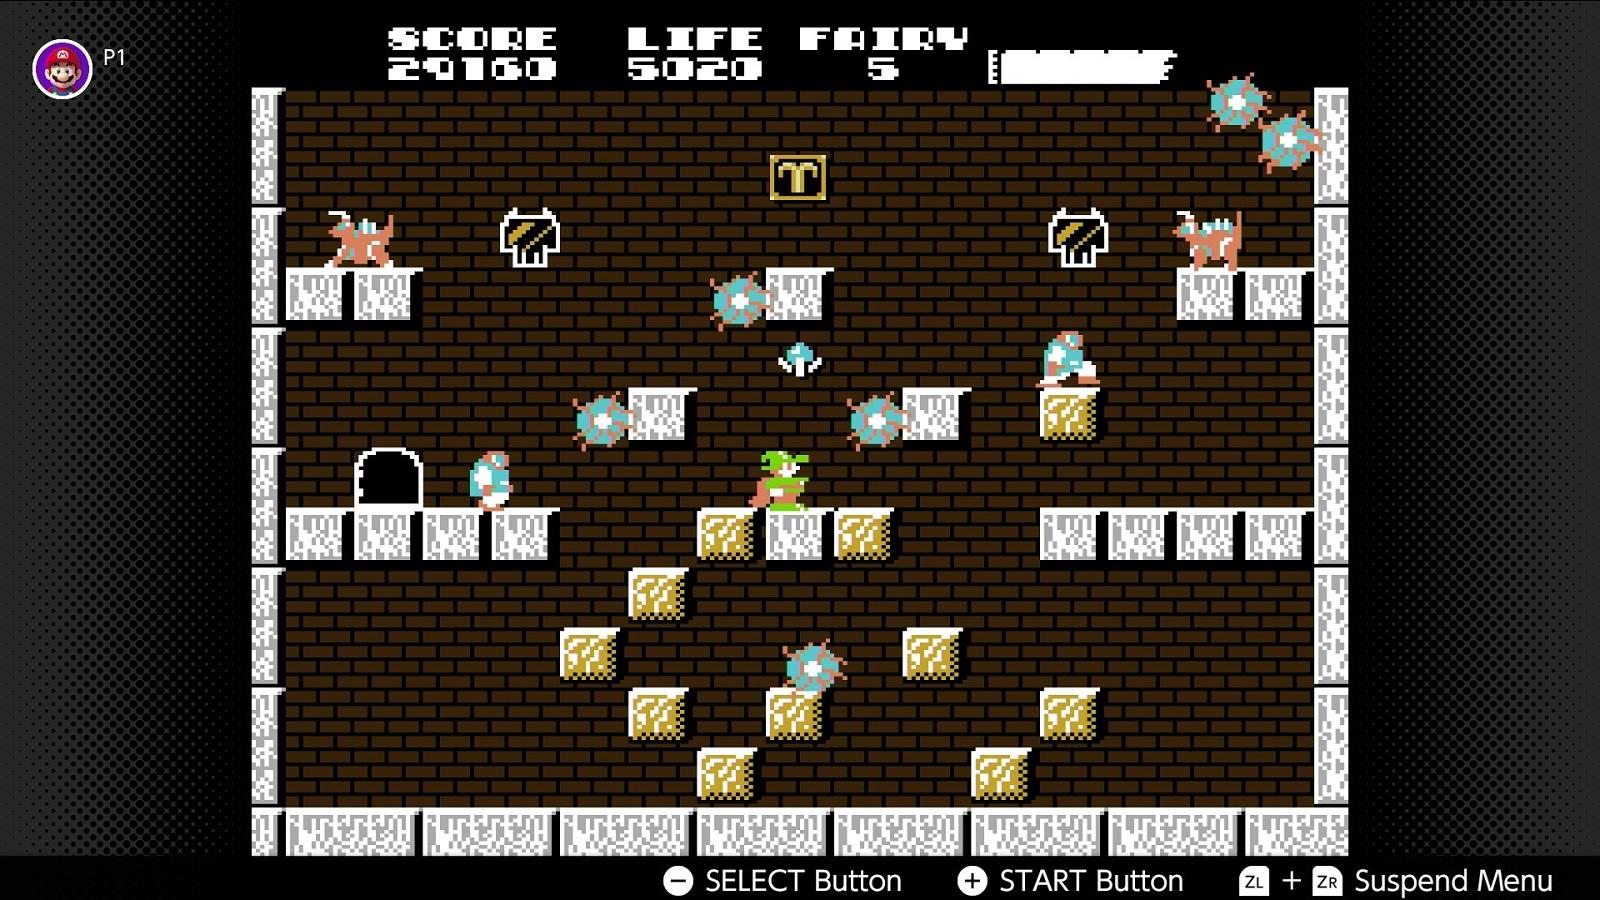 More NES retro revivals come to Nintendo Switch Online today